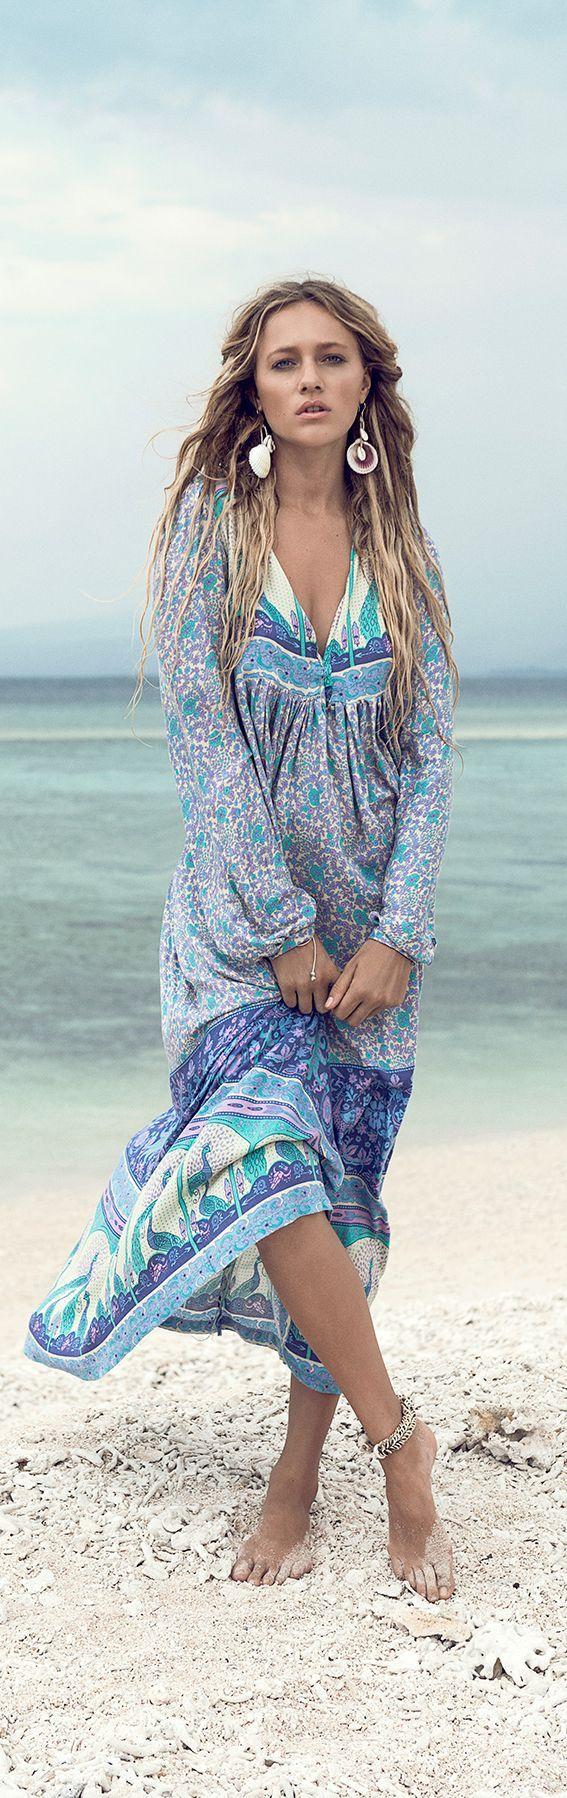 "╰☆╮Boho chic bohemian boho style hippy hippie chic bohème vibe gypsy fashion indie folk the 70s . ╰☆╮ ""Island Boho"" by Spell Designs                                                                                                                                                     More"